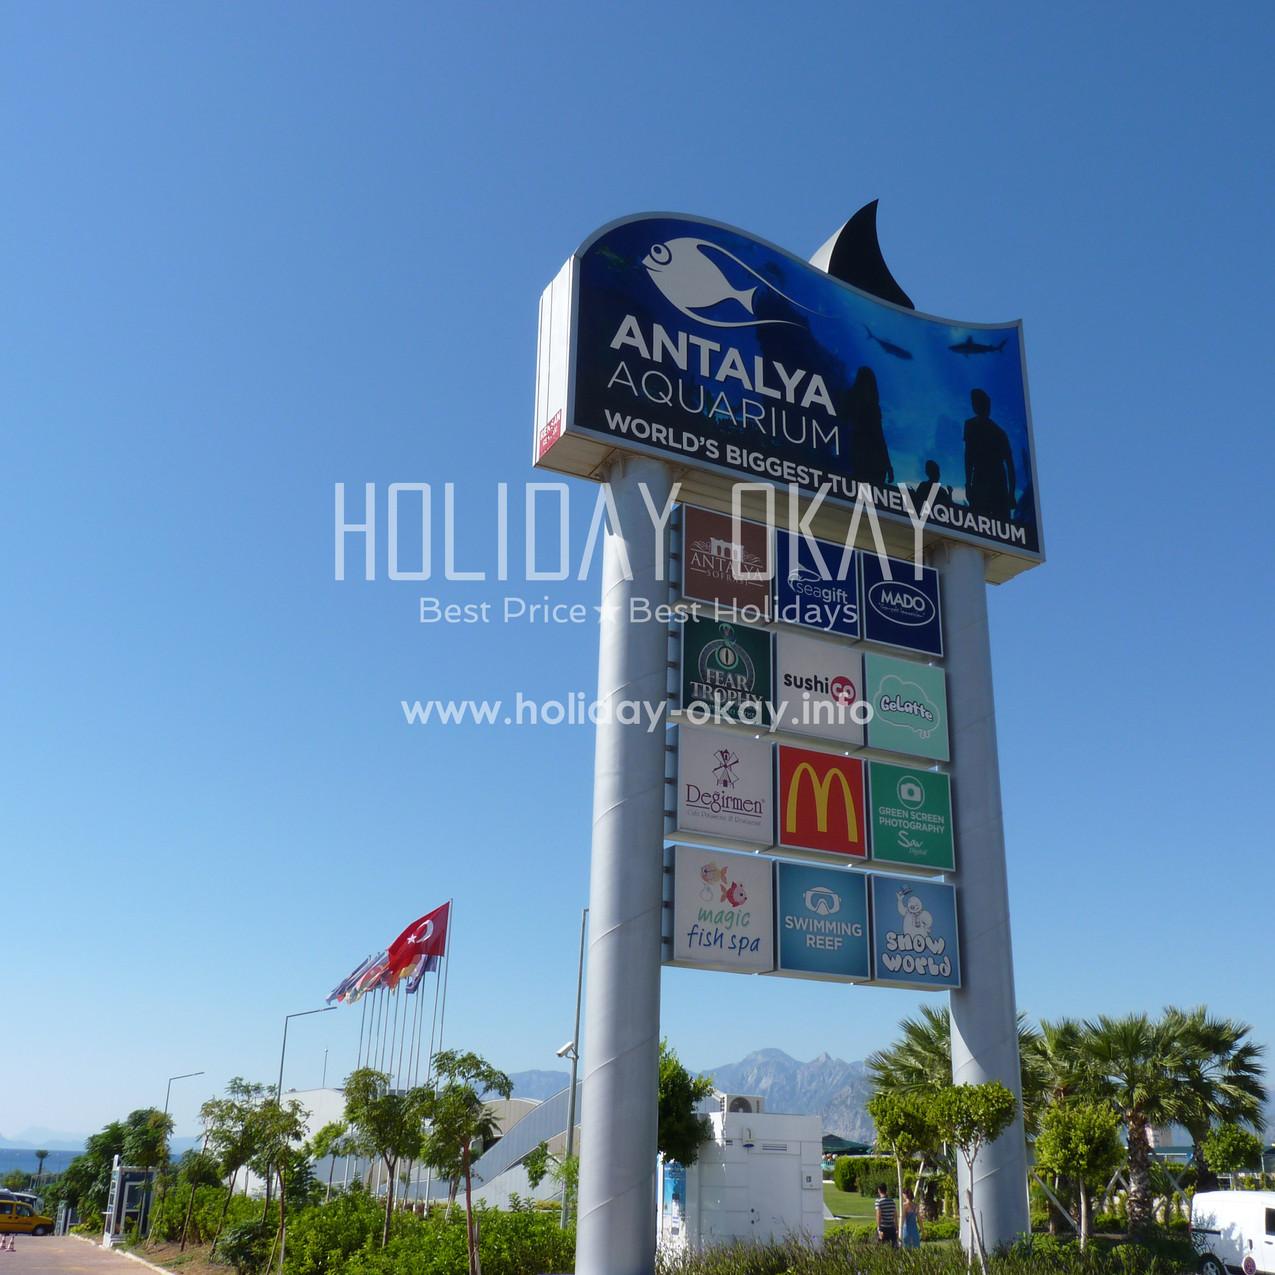 HOLIDAY OKAY | ANTALYA AQUARIUM